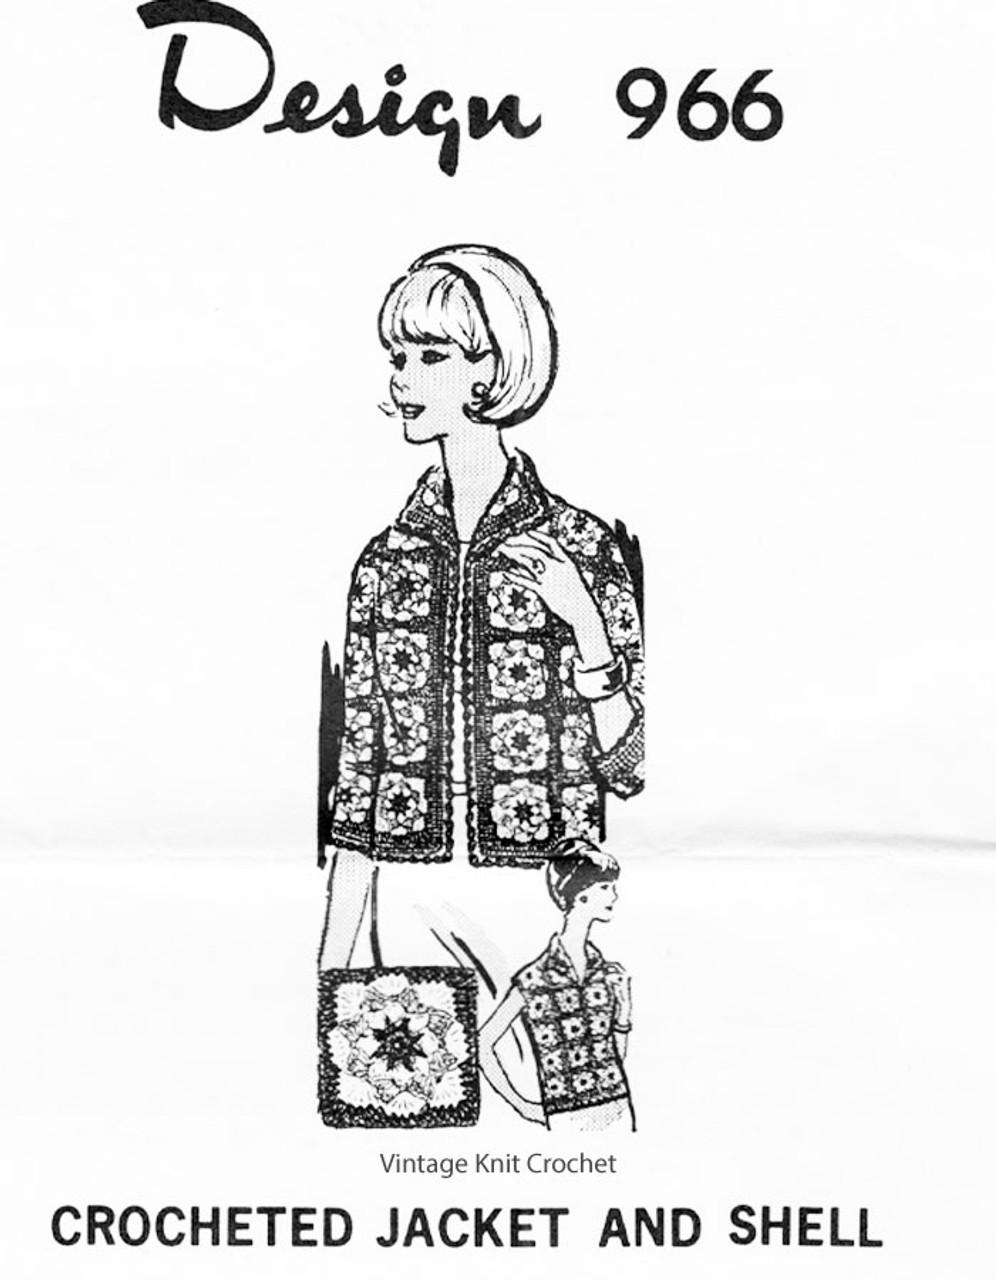 Crochet Granny Square Jacket Pattern, Mail Order 966